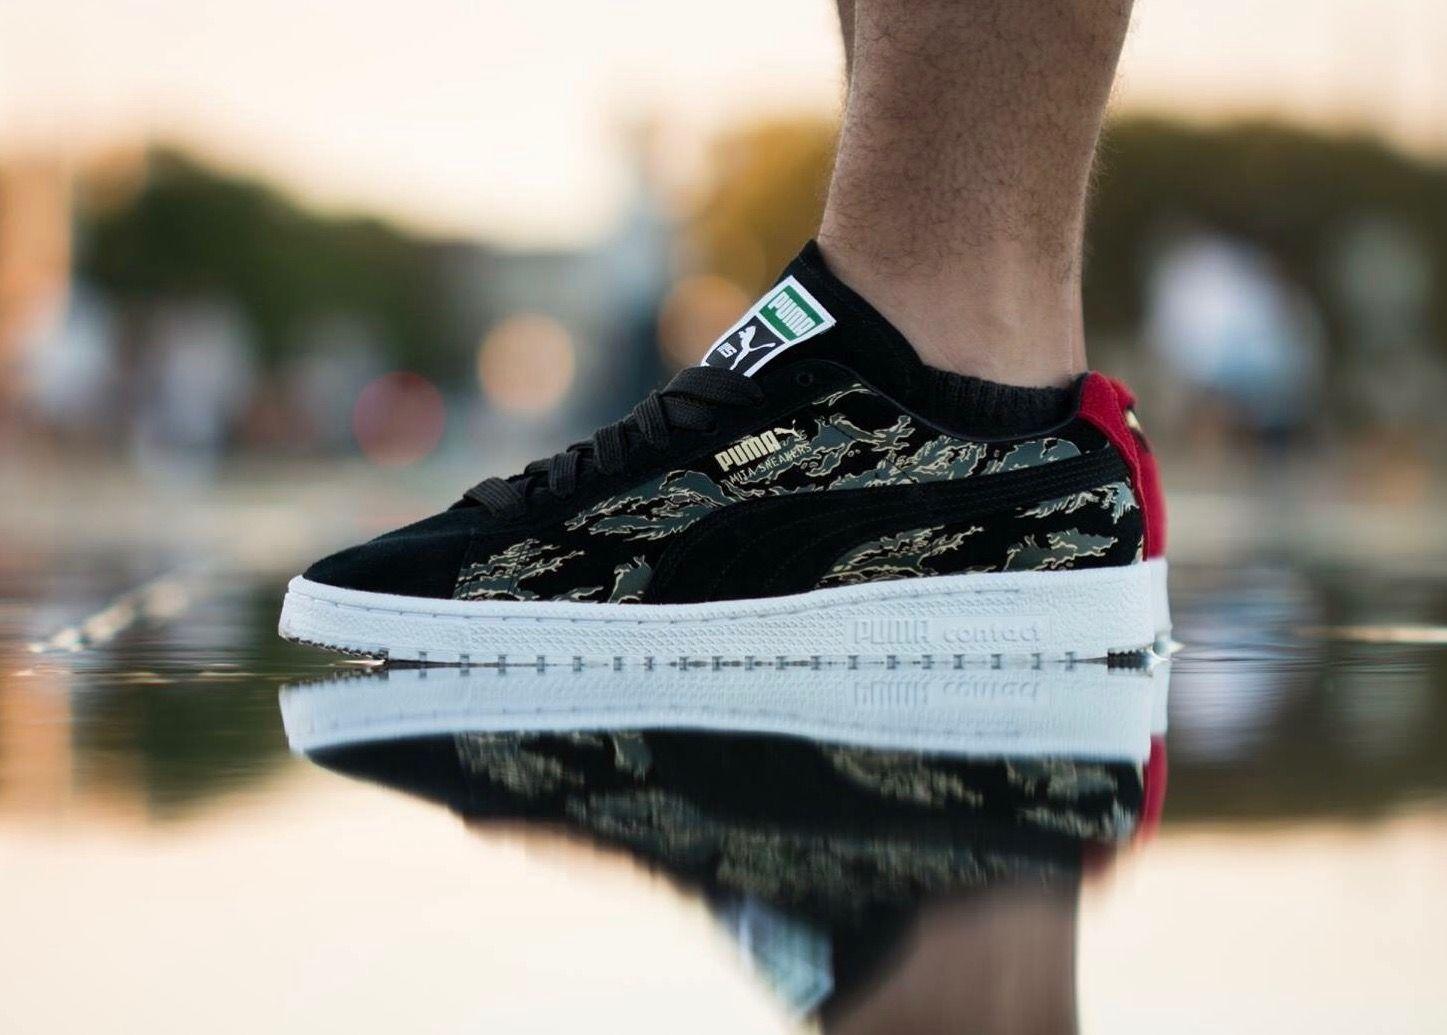 Mita Sneakers x Puma Suede | Puma suede outfit, Sneakers men ...